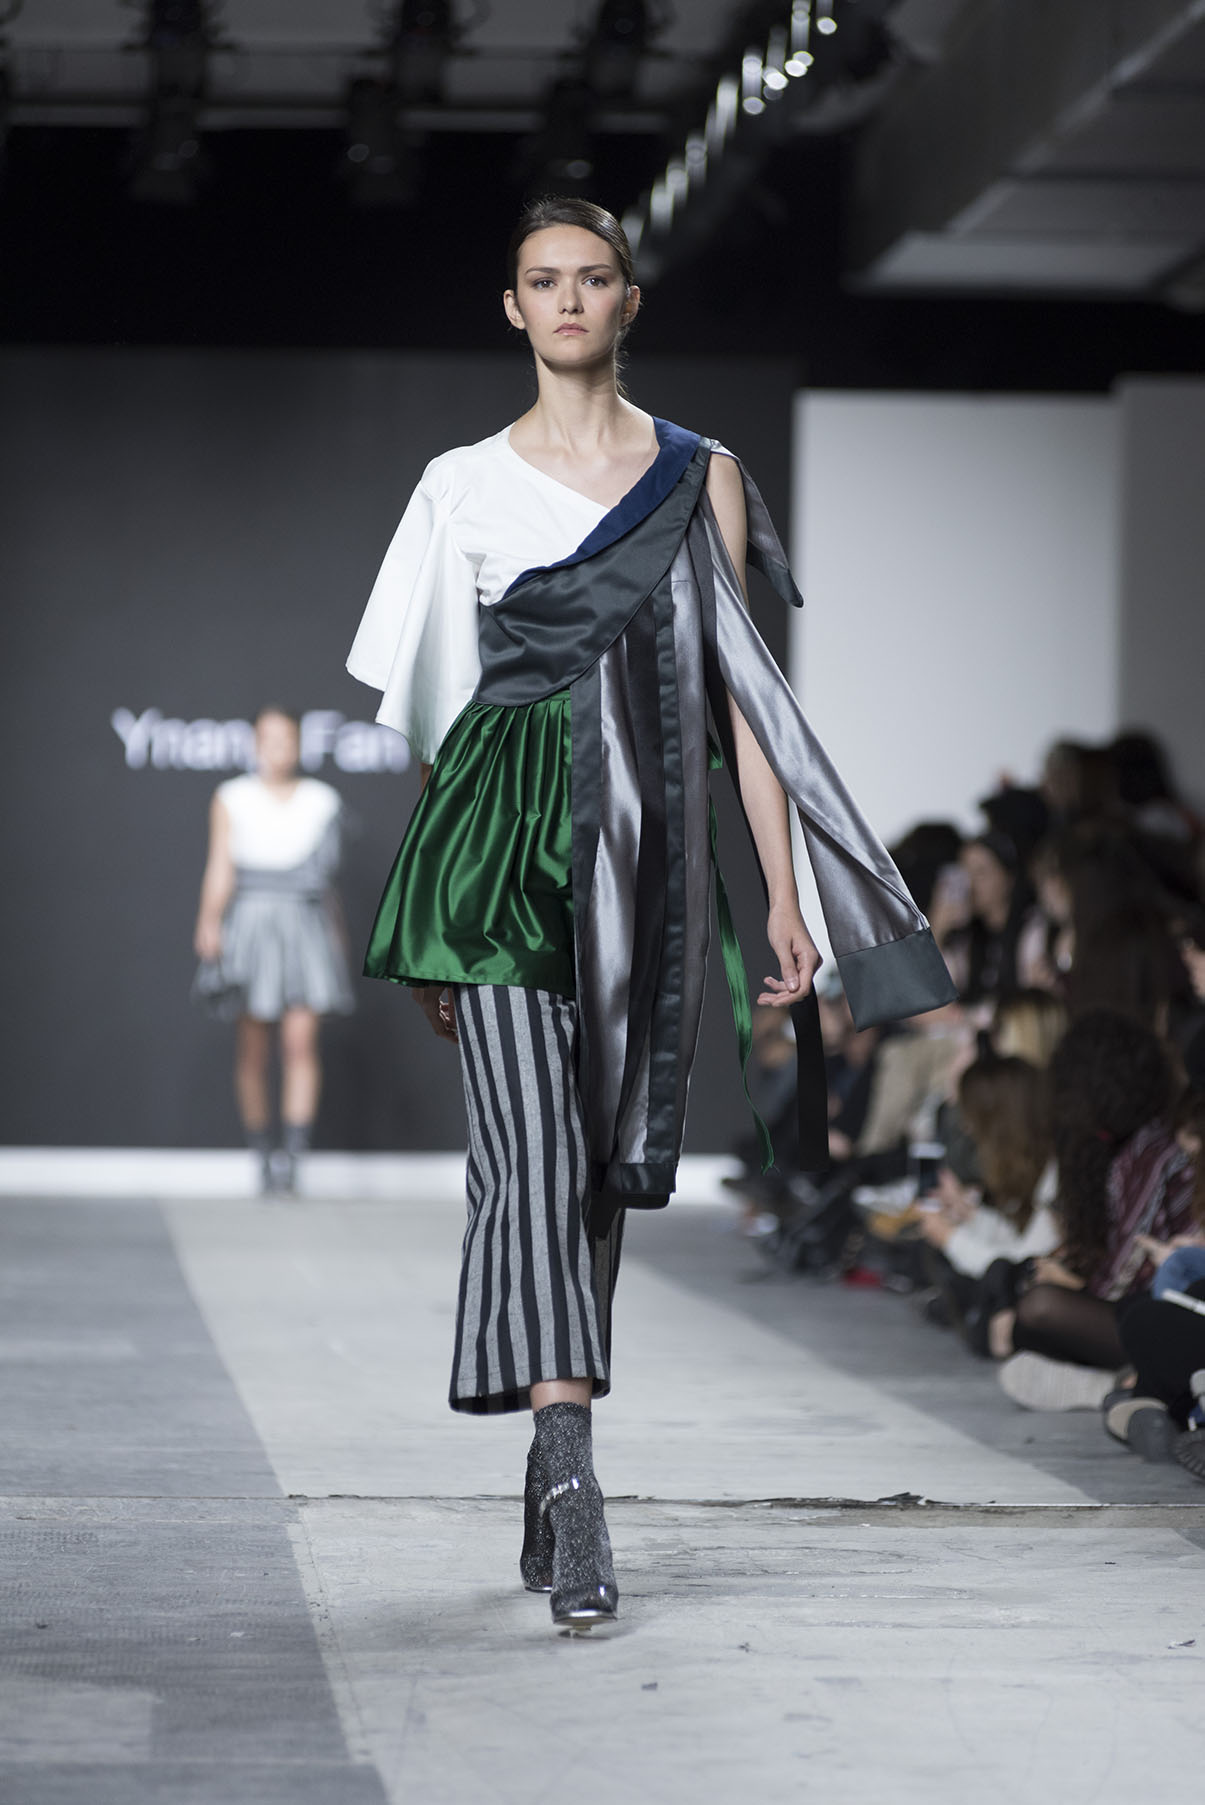 Fashion Designer: Ynang fan - Fashion Graduate Italia Fashion Show - Accademia di Brera